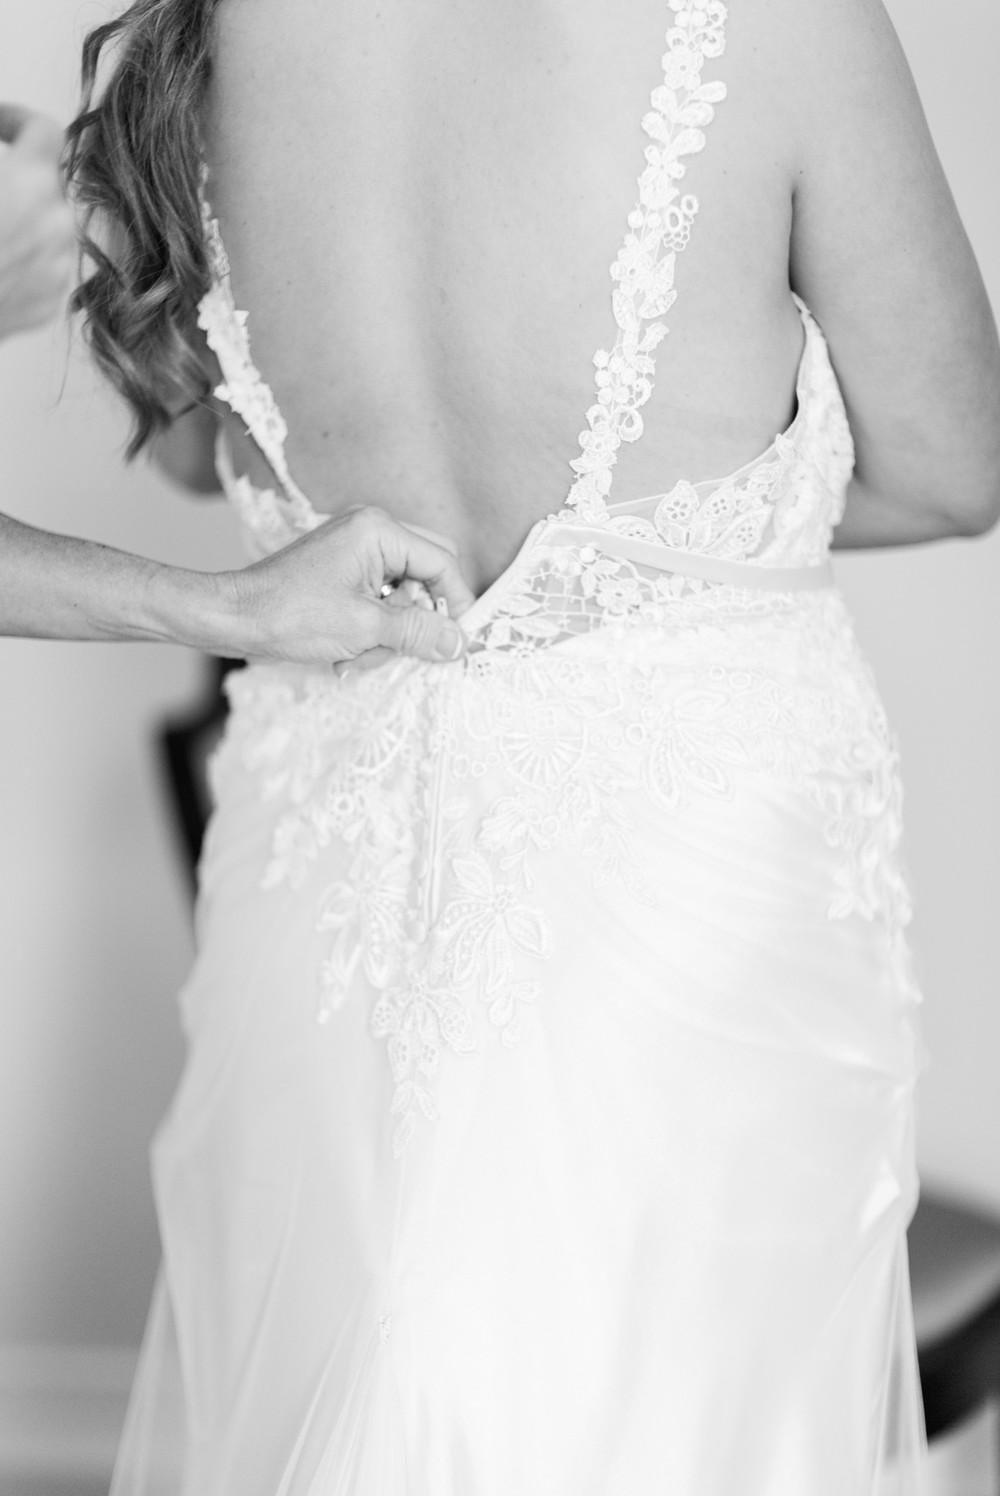 trivium_lynchburg_va_wedding_estate_wedding_photography_wedding_photographers (7).jpg